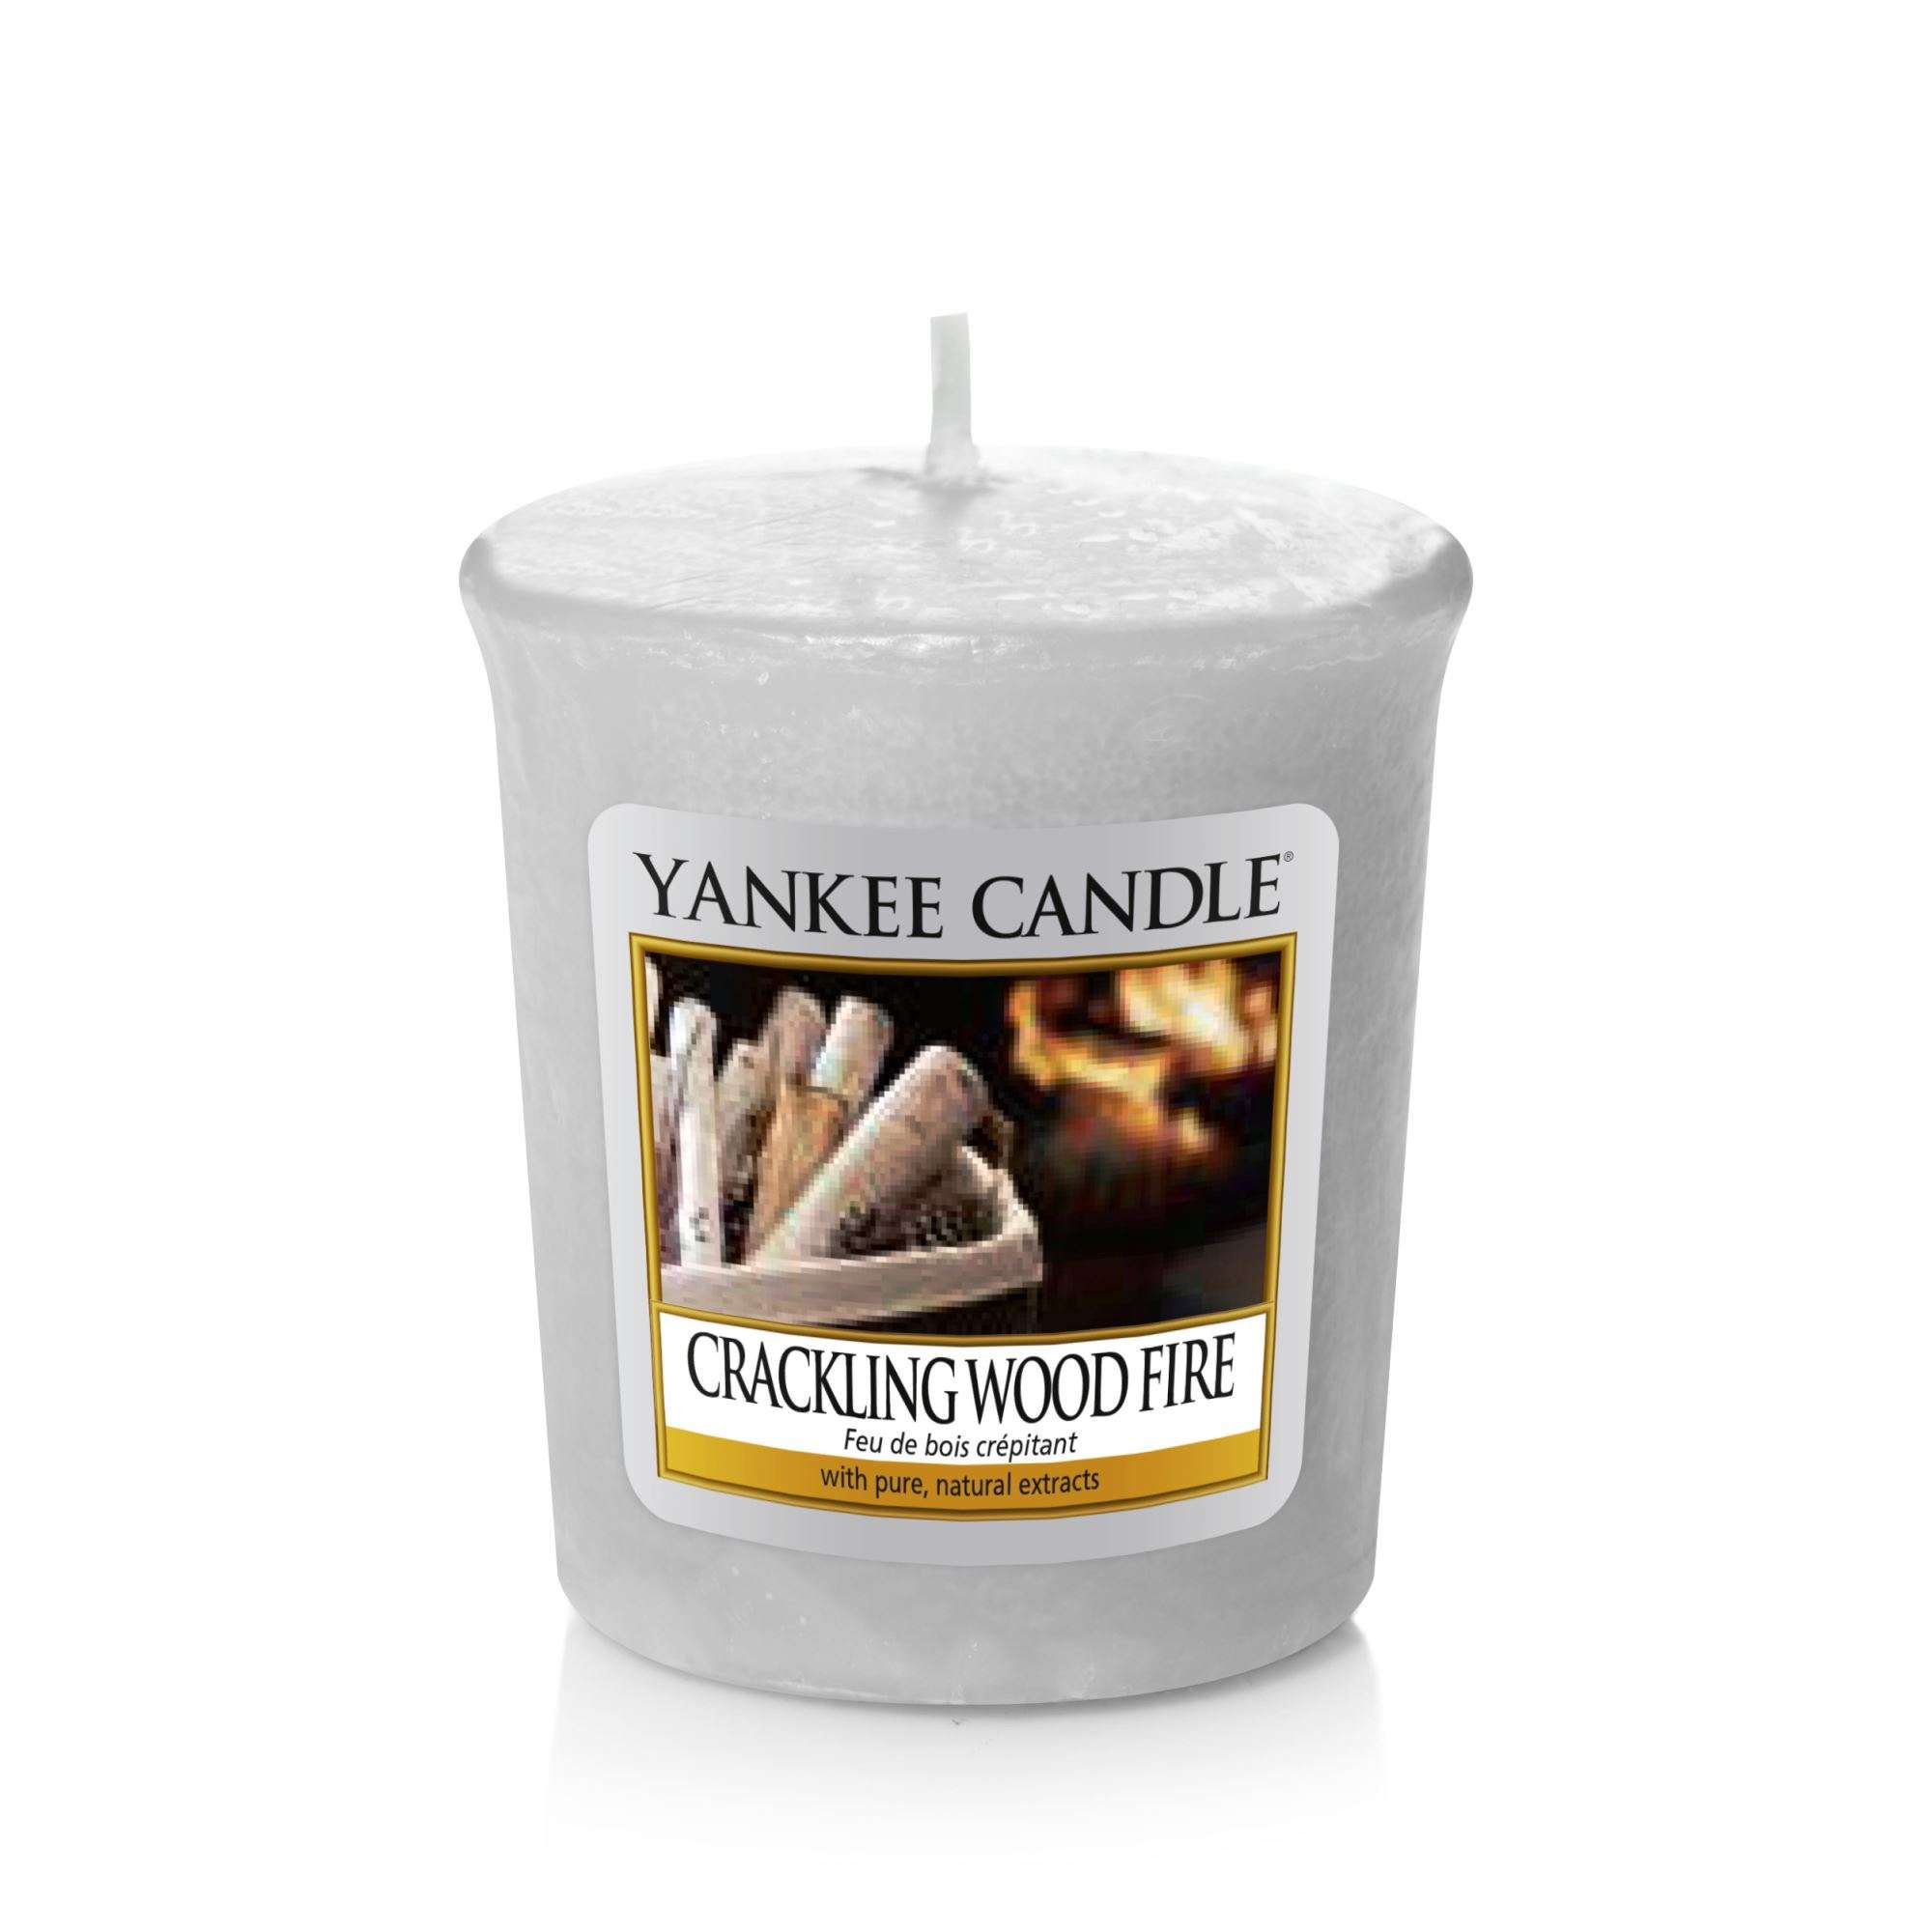 Yankee E crackling wood fire votiv 2000x2000 1280x1280 2x